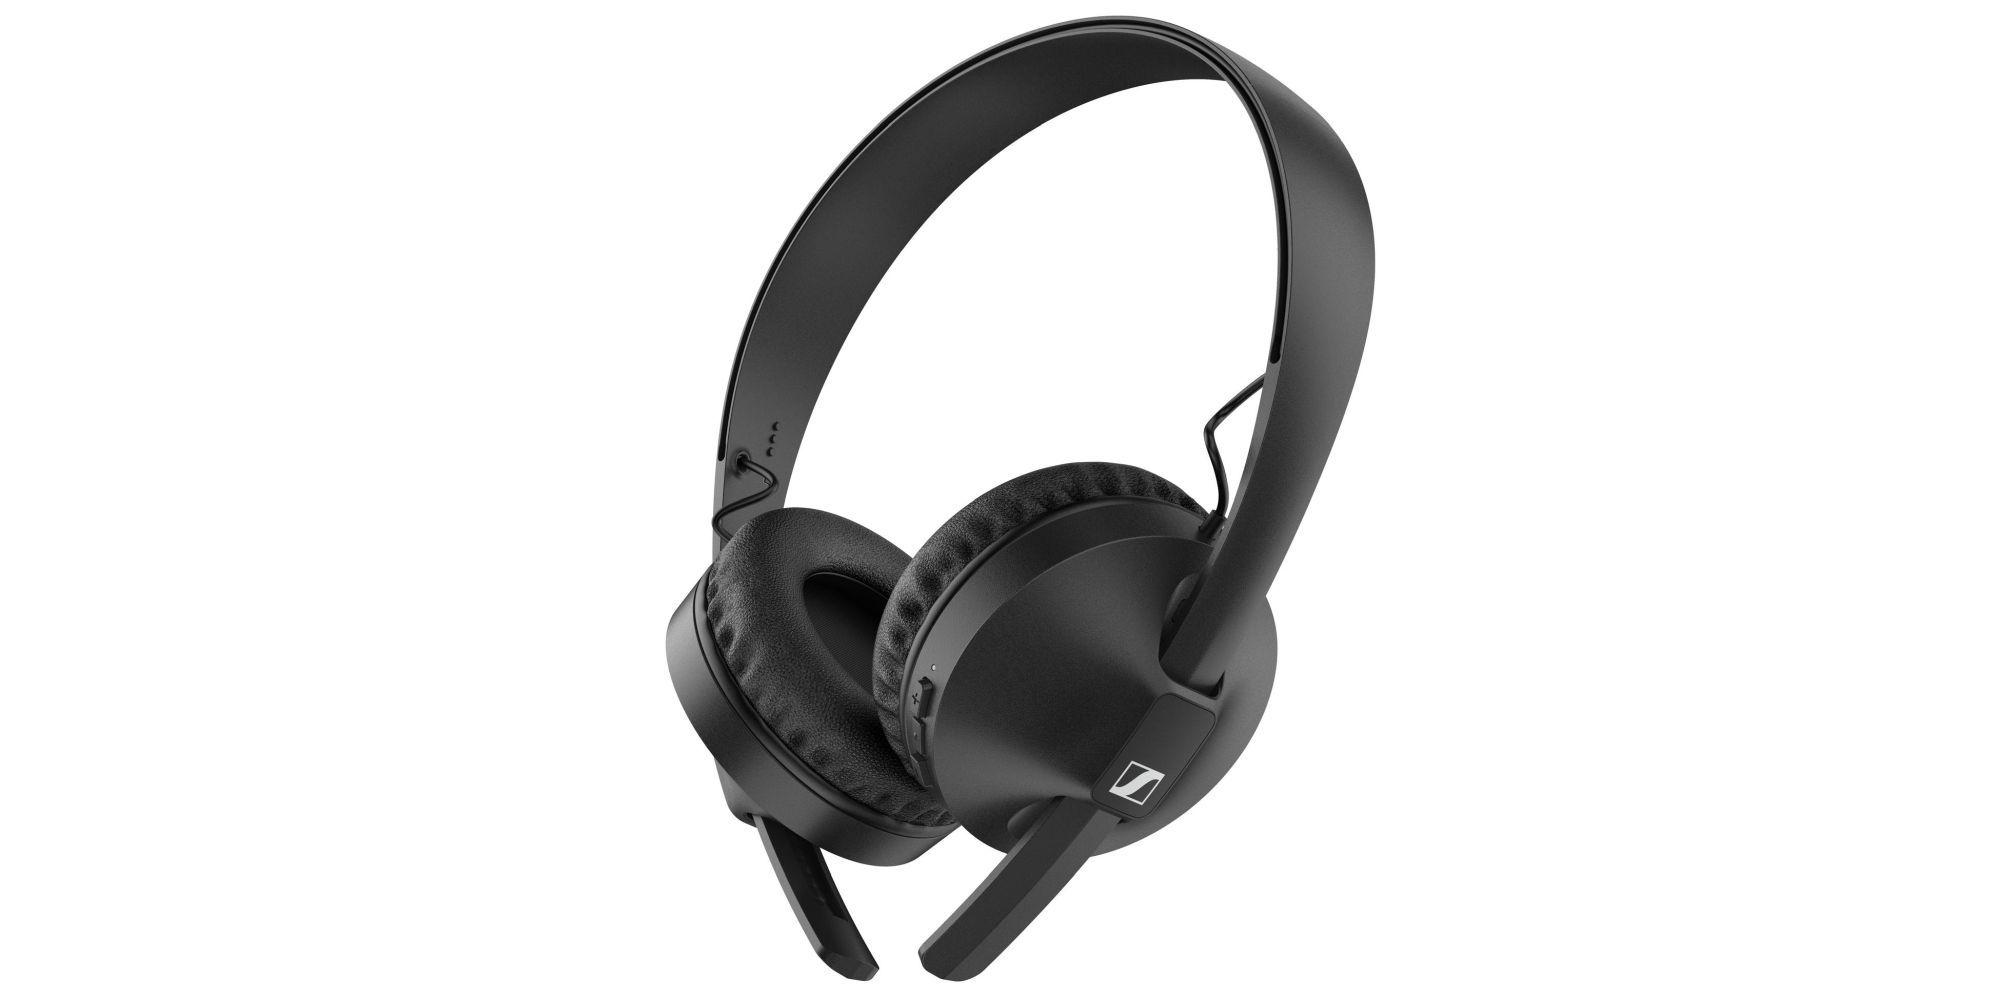 Sennheiser Releases Affordable Premium Headphones